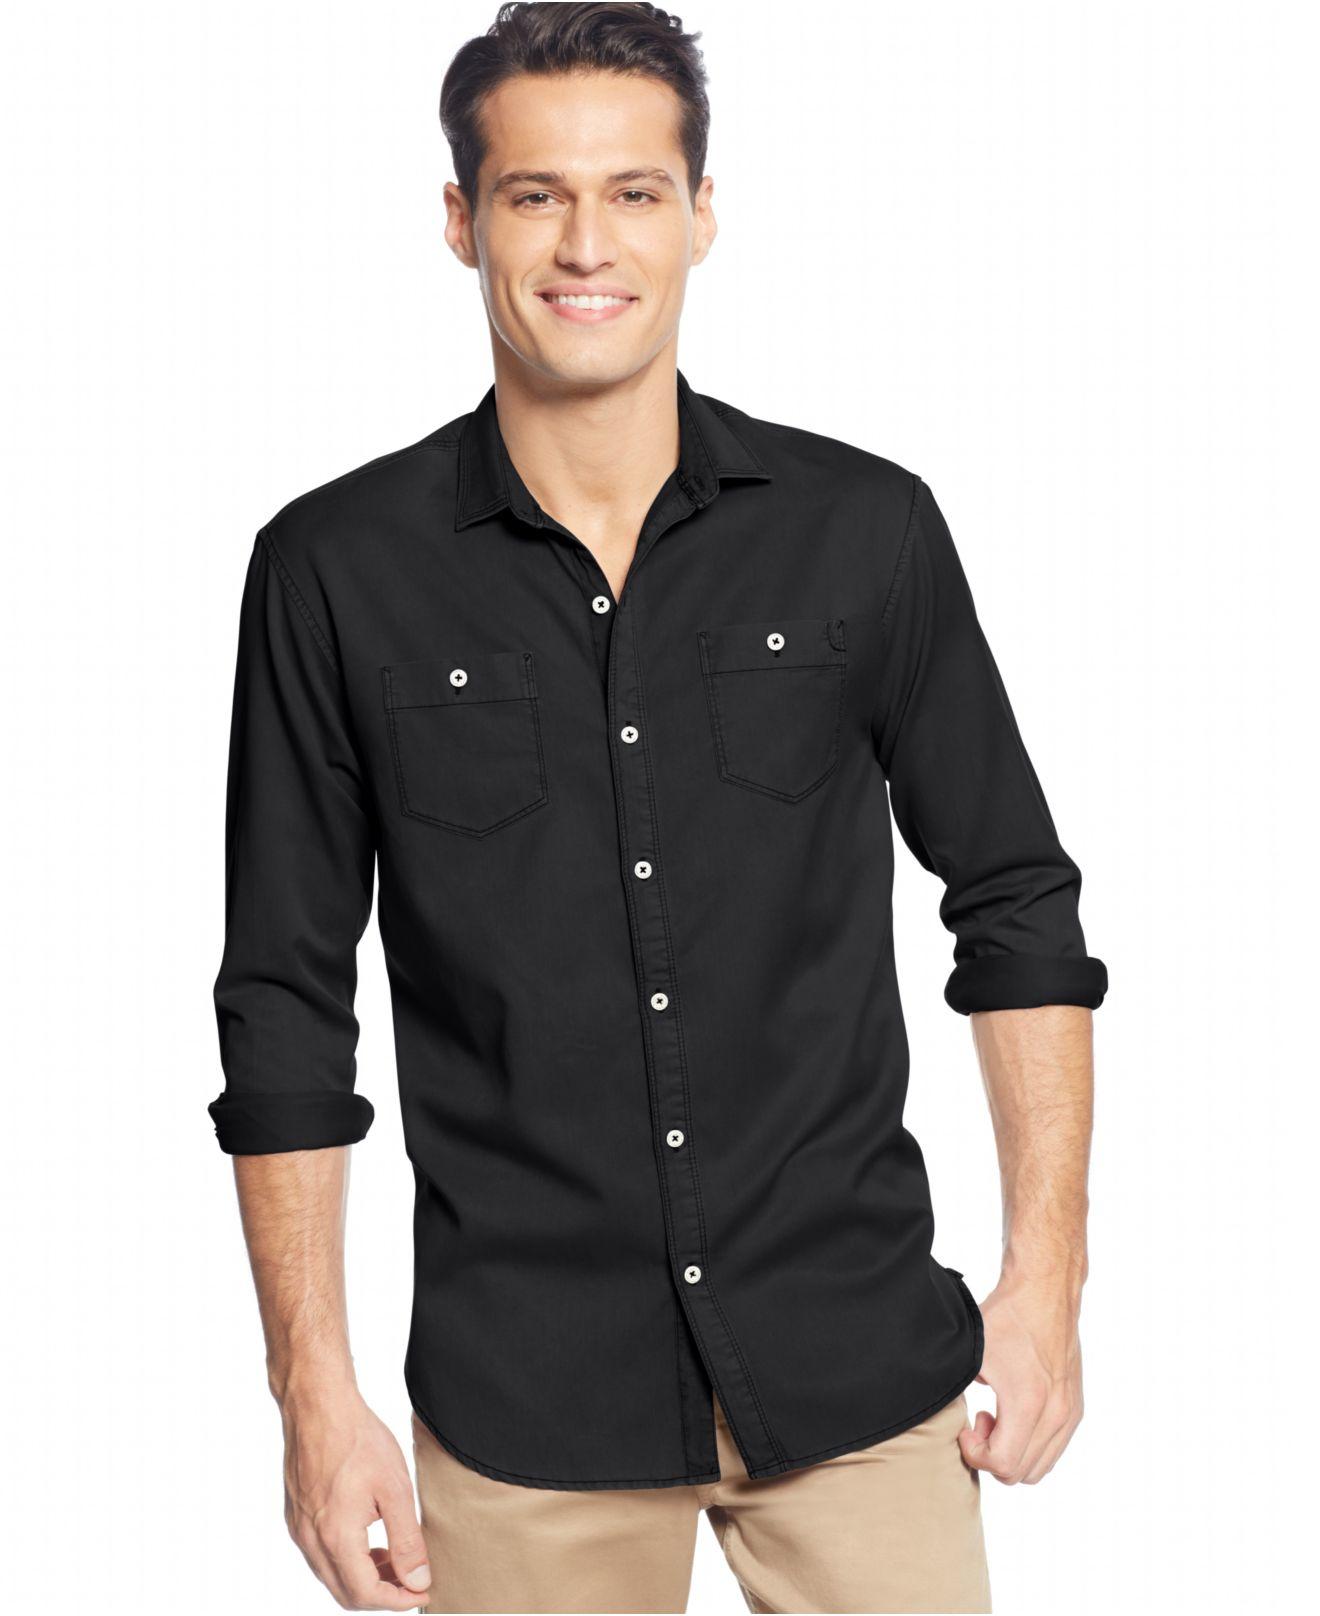 Tommy bahama black long sleeve twill shirt for men lyst for Tommy bahama long sleeve dress shirts